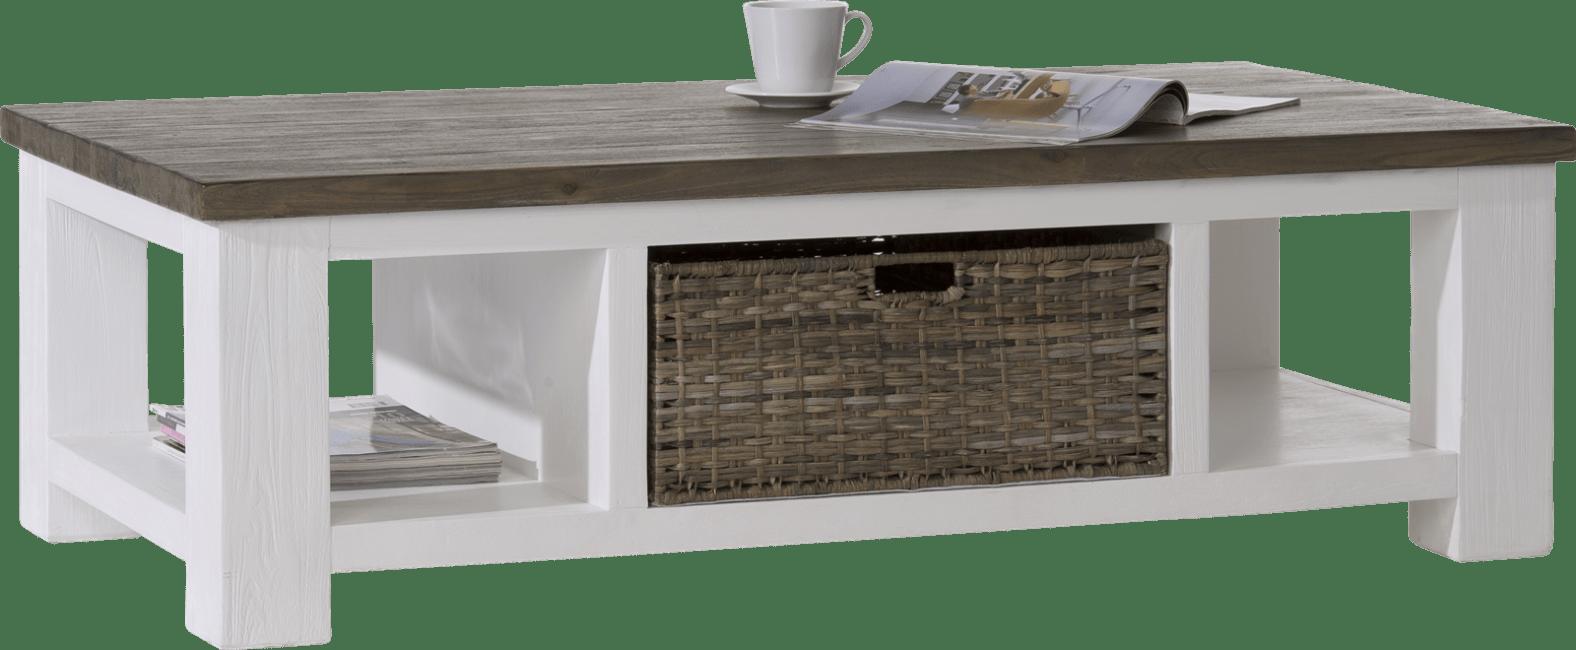 Deaumain - salontafel 130 x 70 cm 1-mand t&t + 2-niches